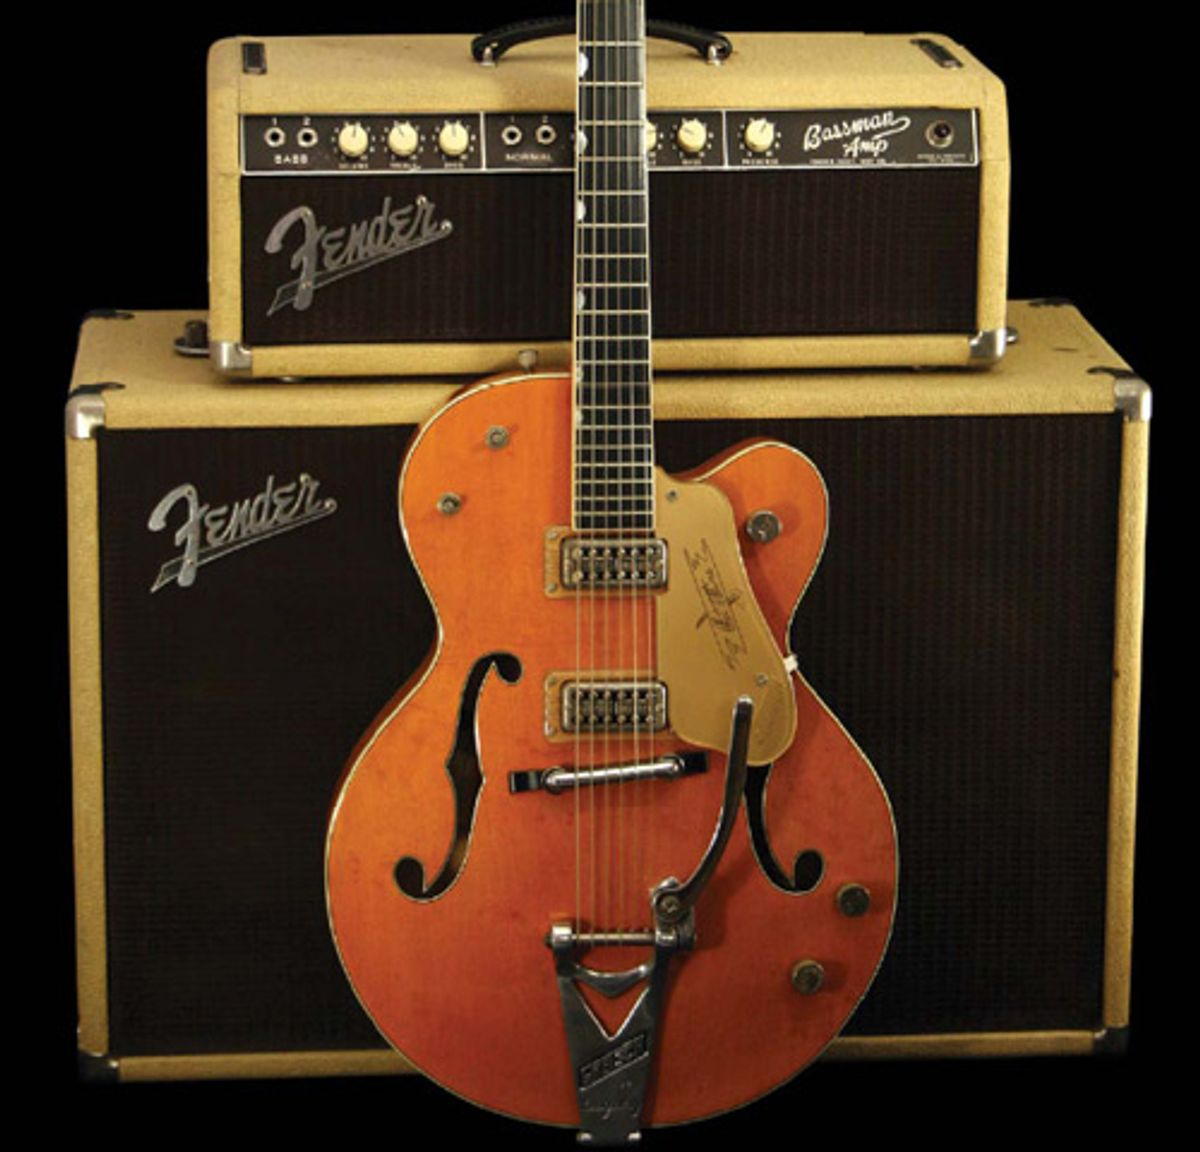 1961 Gretsch Chet Atkins Hollowbody Model 6120 Serial #40749